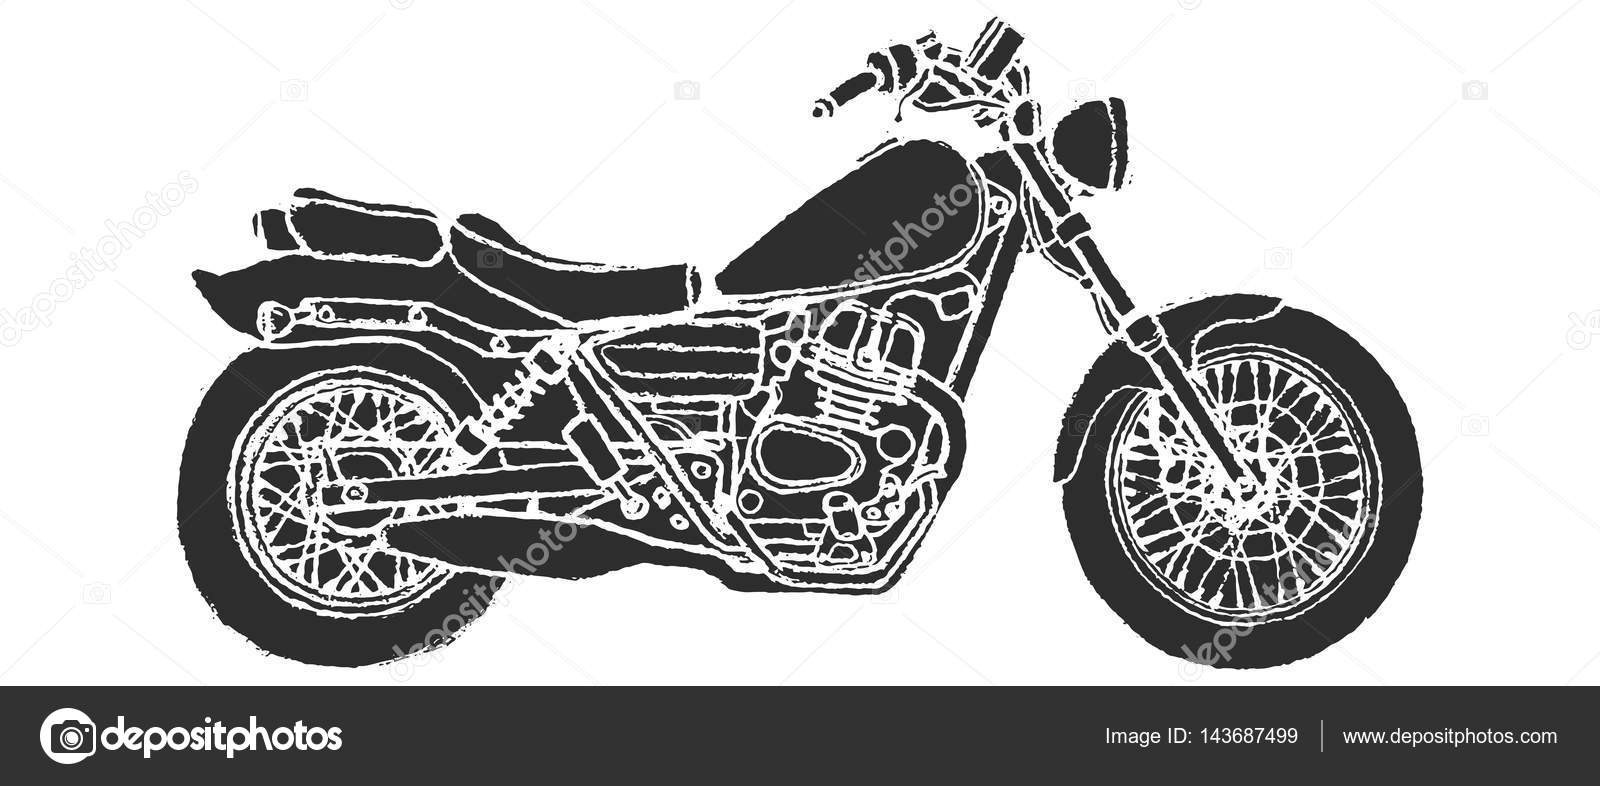 Motor De Moto Dibujo Vista Lateral De Motos Dibujo Mano